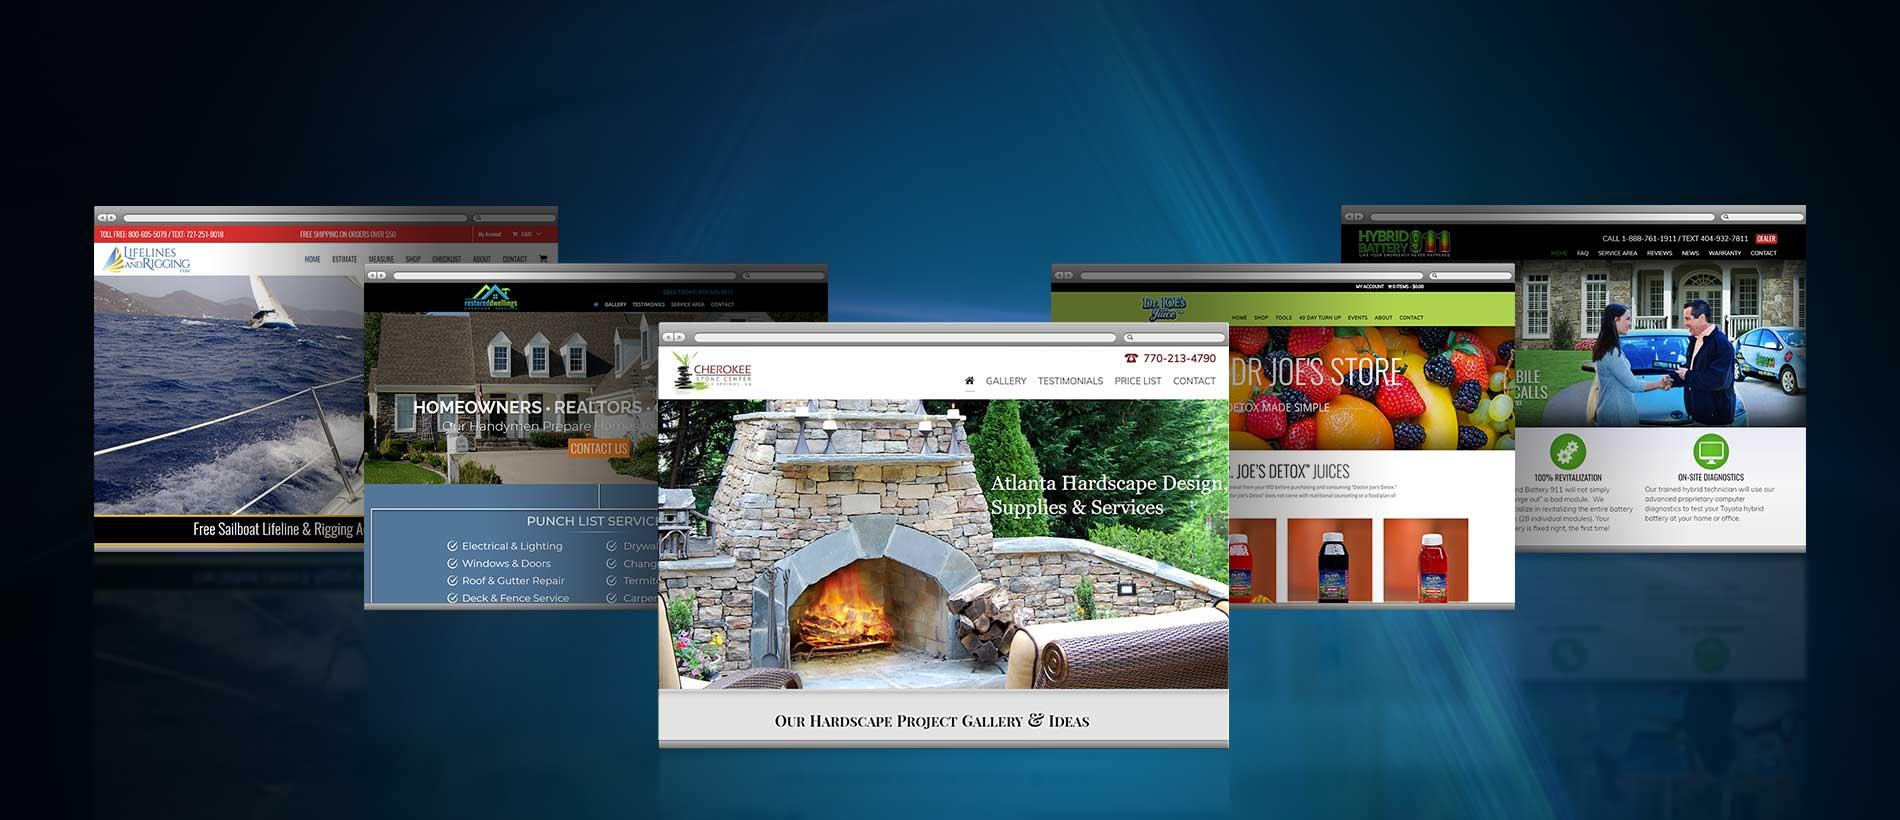 WordPress Business Website Designers